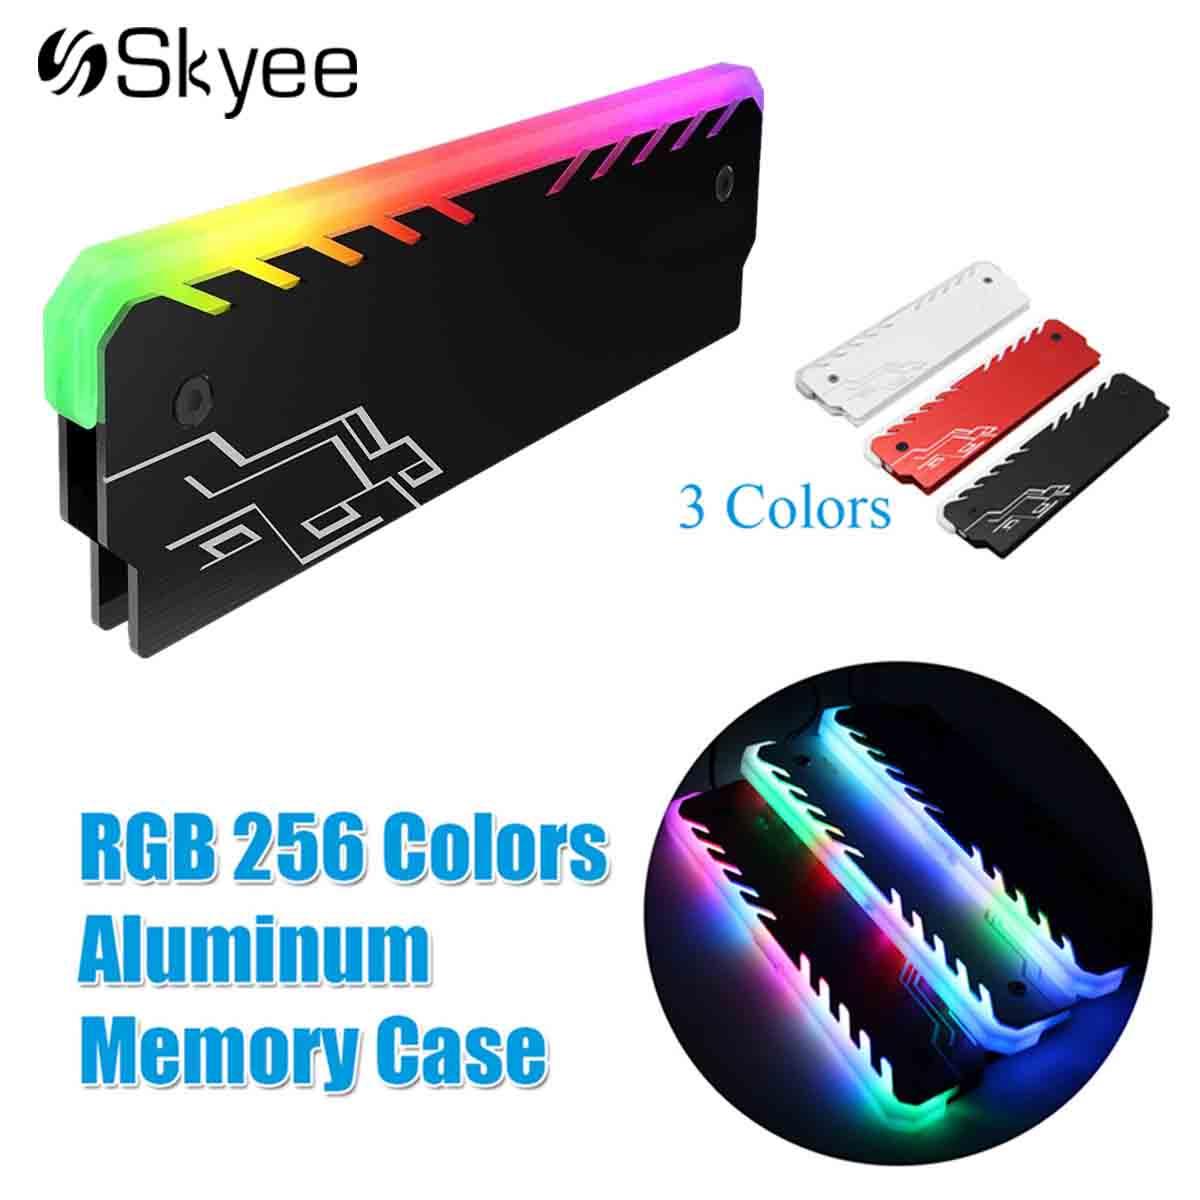 Aluminum-magnesium Alloy Ram Cooling Heatsink 265 Color RGB Light Effect Glow Desktop PC Memory Cooling Vest RAM Cooler Shell ram 399u